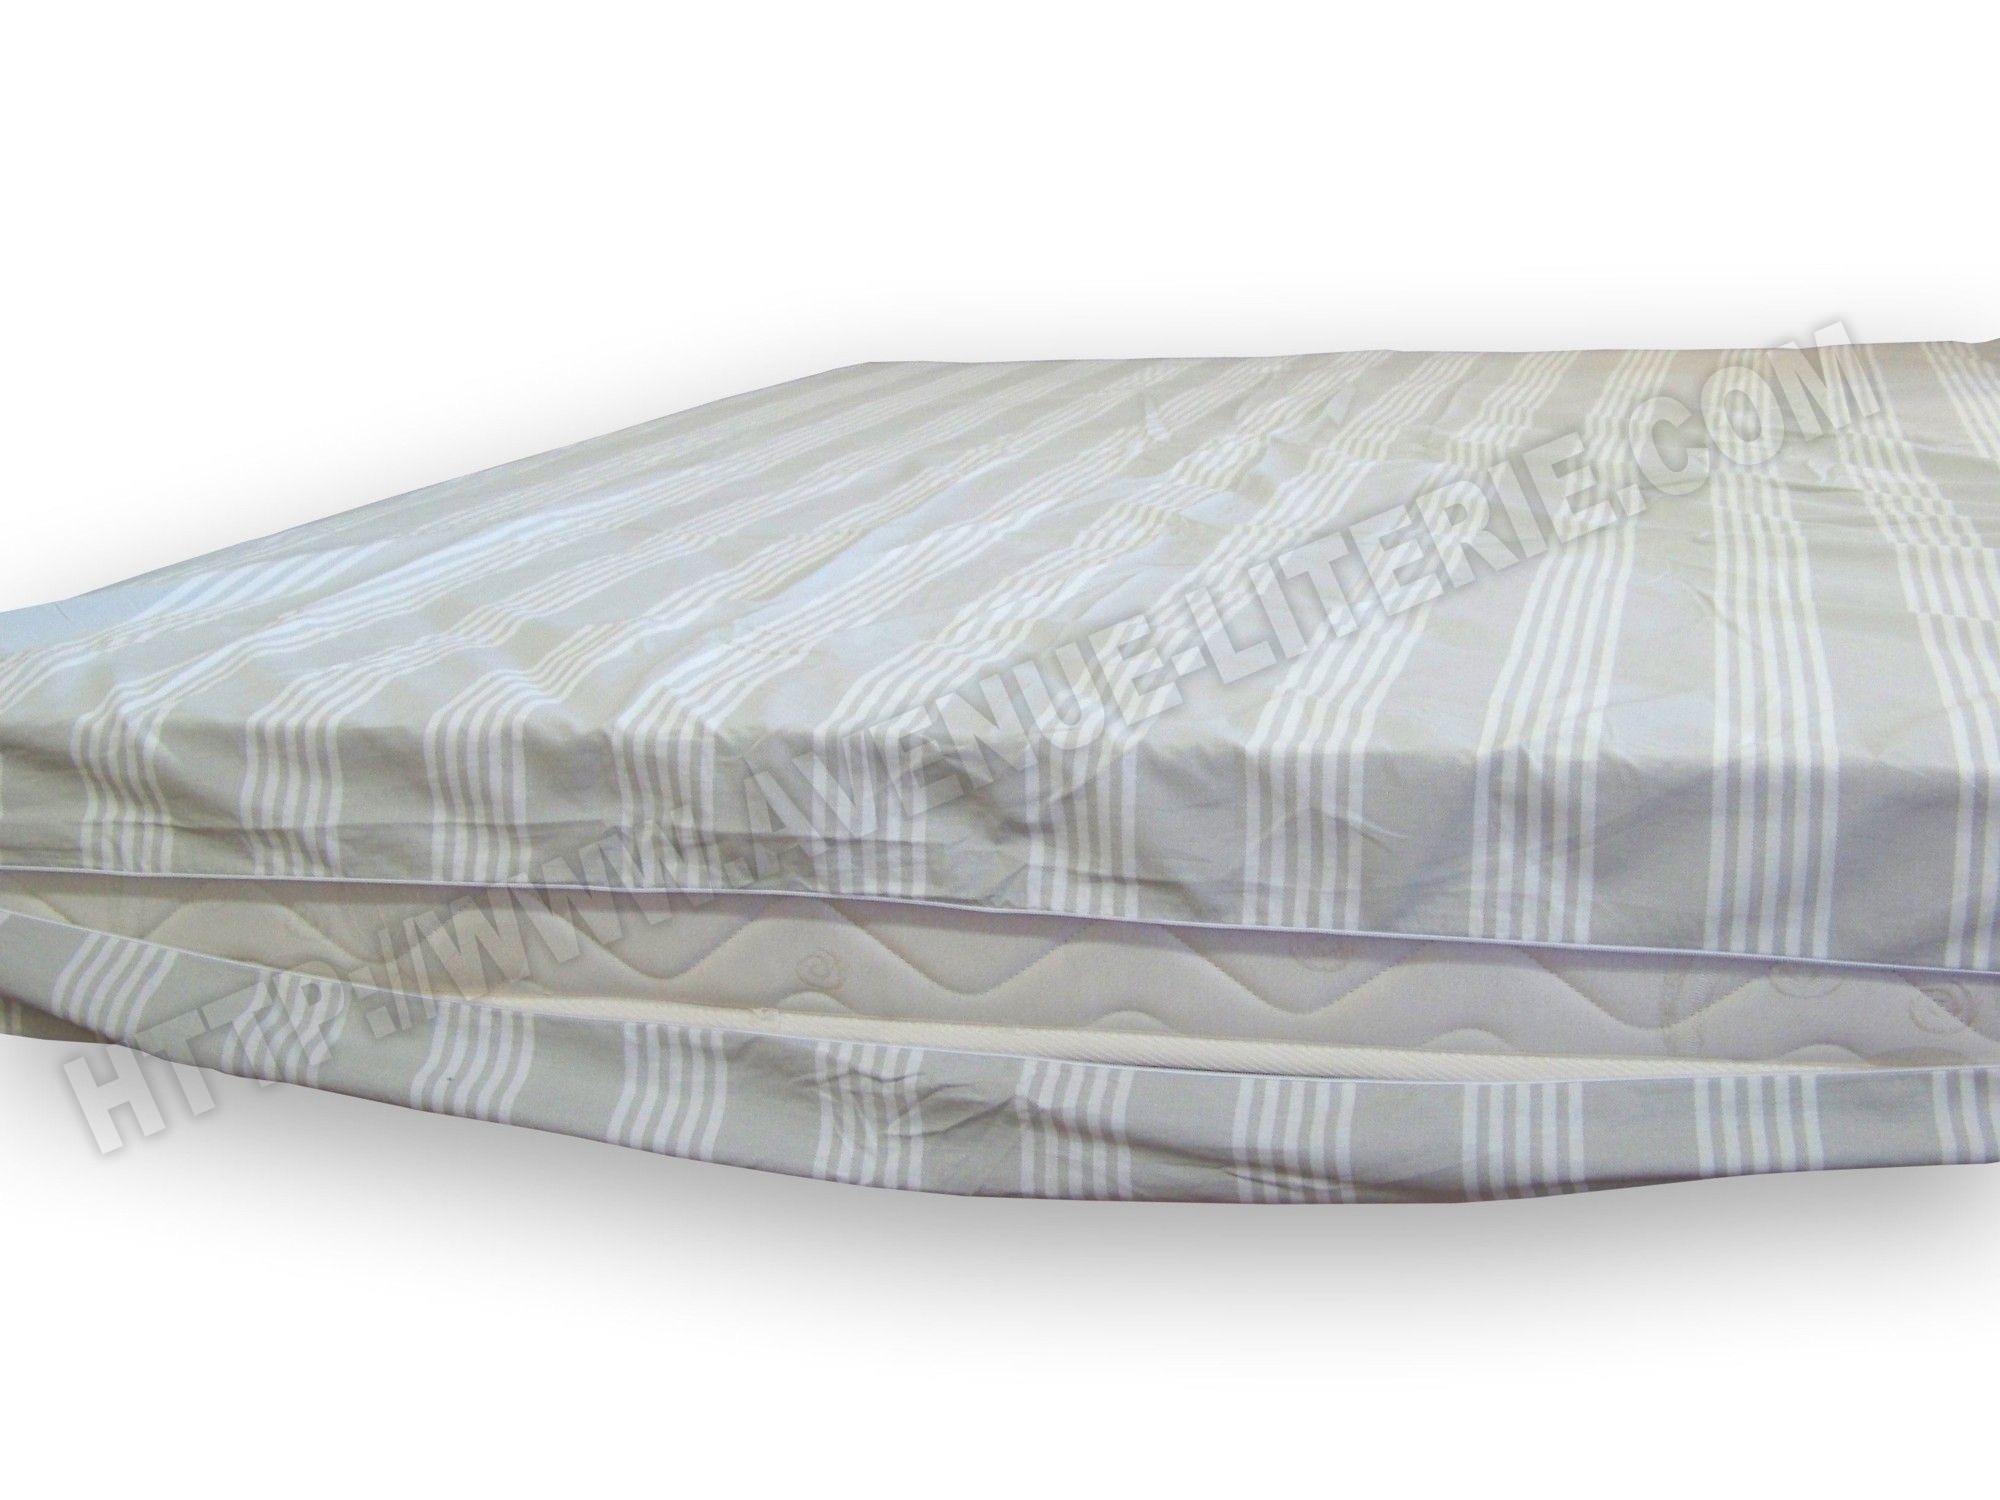 housse r nove matelas rubens 80x190 h 30 cm nuit des vosges. Black Bedroom Furniture Sets. Home Design Ideas